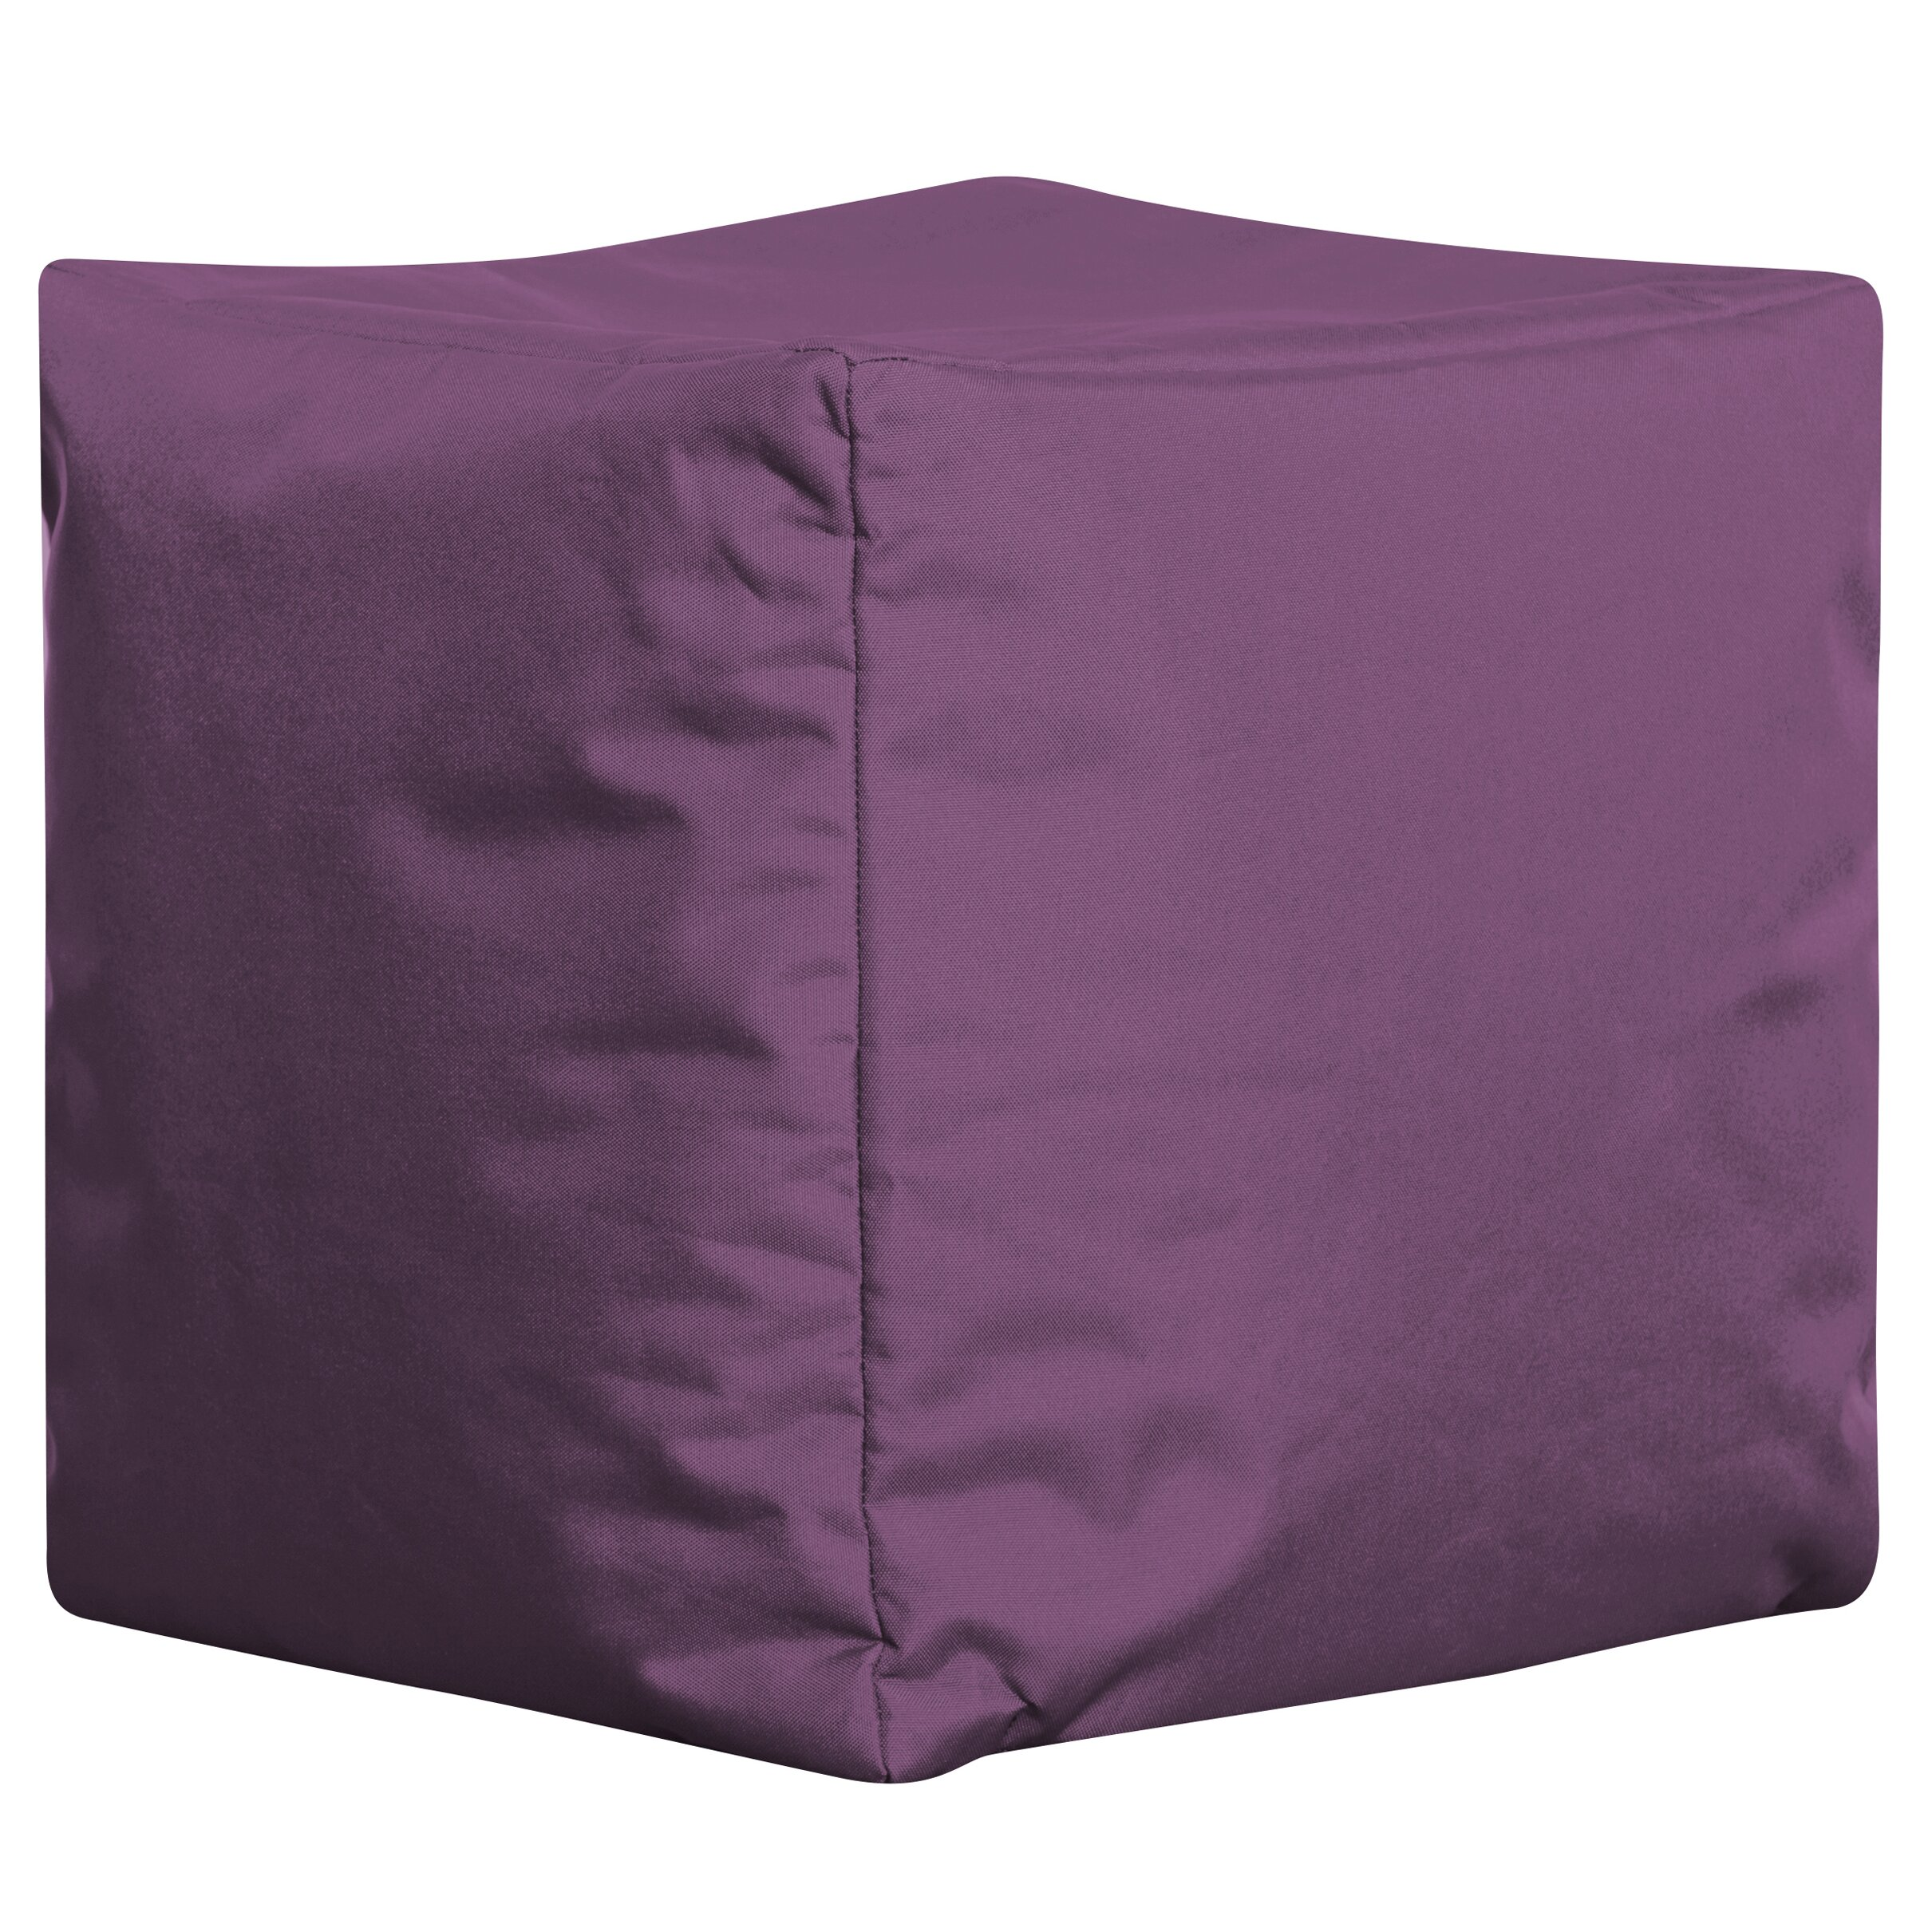 sittingpoint cube pouf ottoman reviews. Black Bedroom Furniture Sets. Home Design Ideas